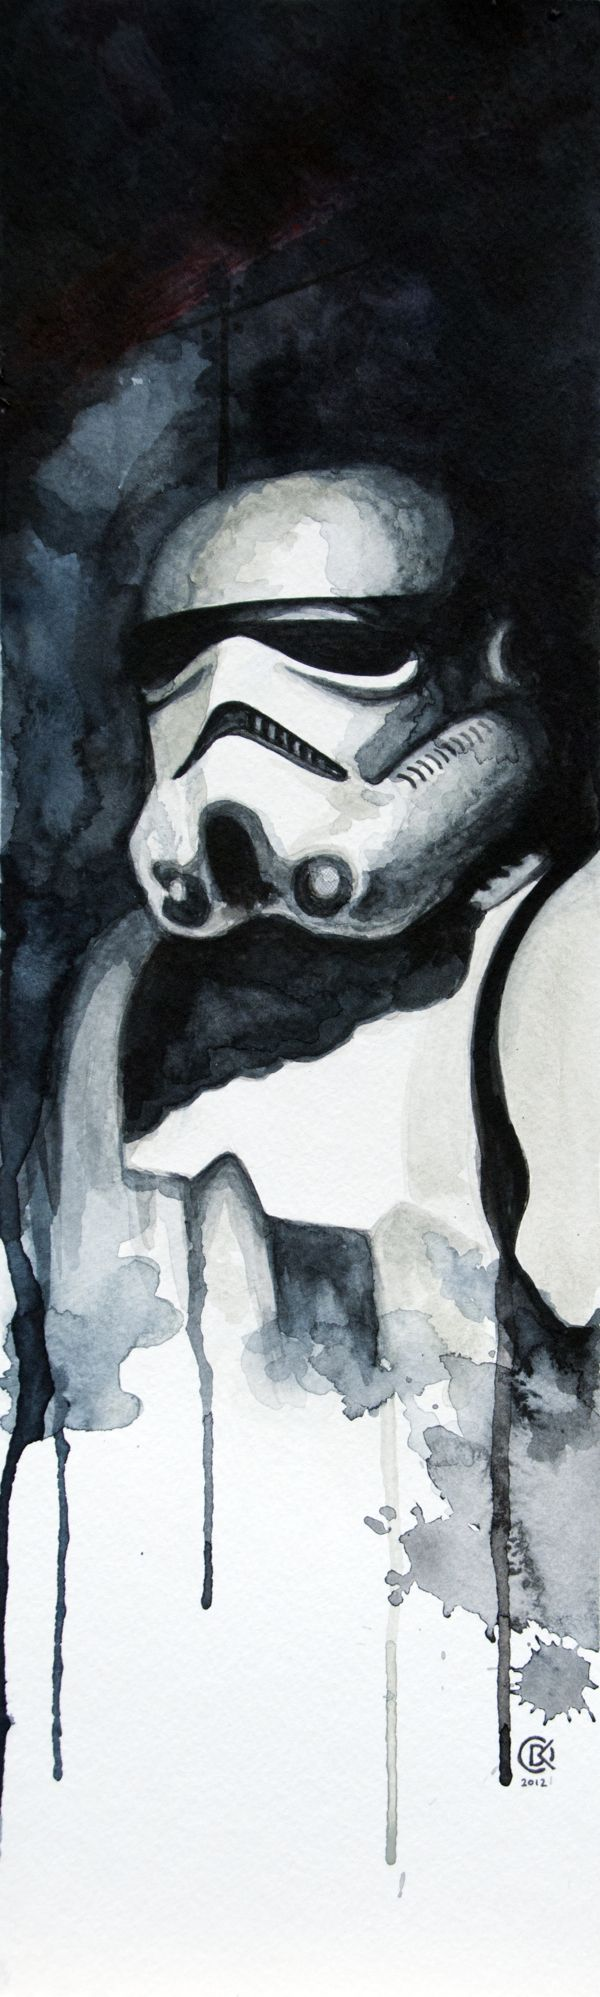 Stormtrooper (watercolor study) | By: David Kraig, via Behance (#stormtrooper #starwars)